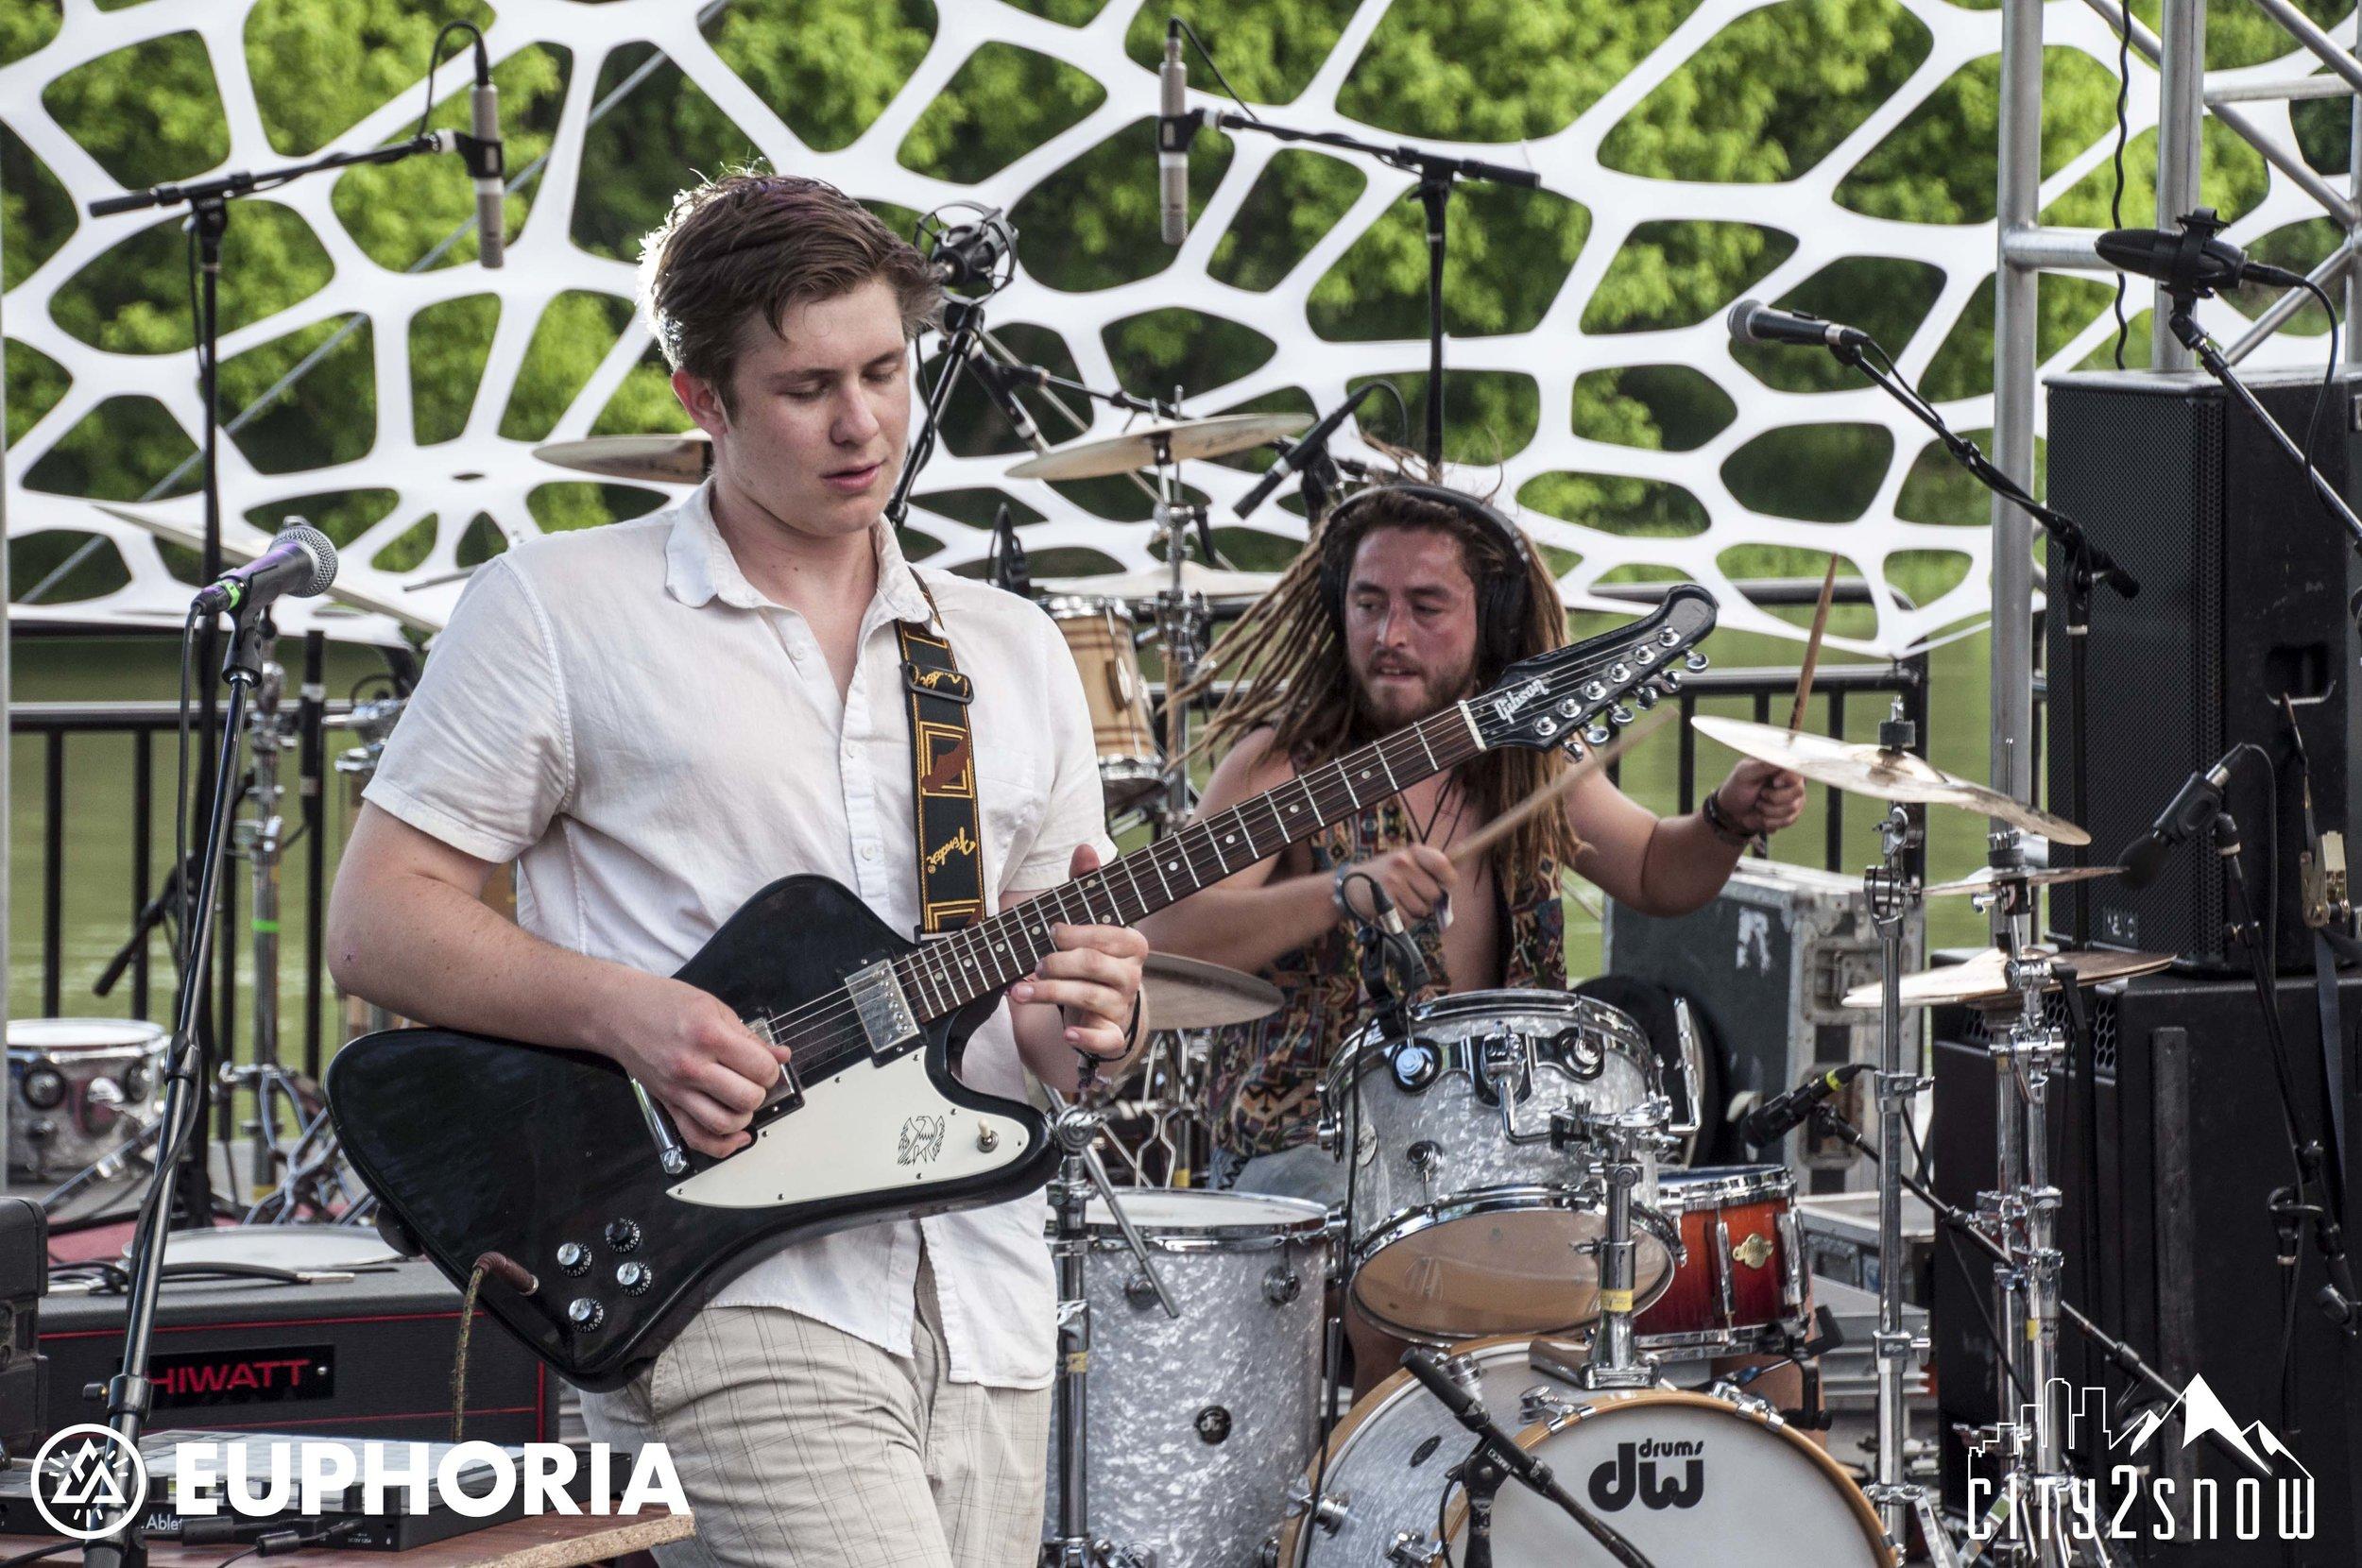 Euphoria-Music-Festival-2017-43.jpg